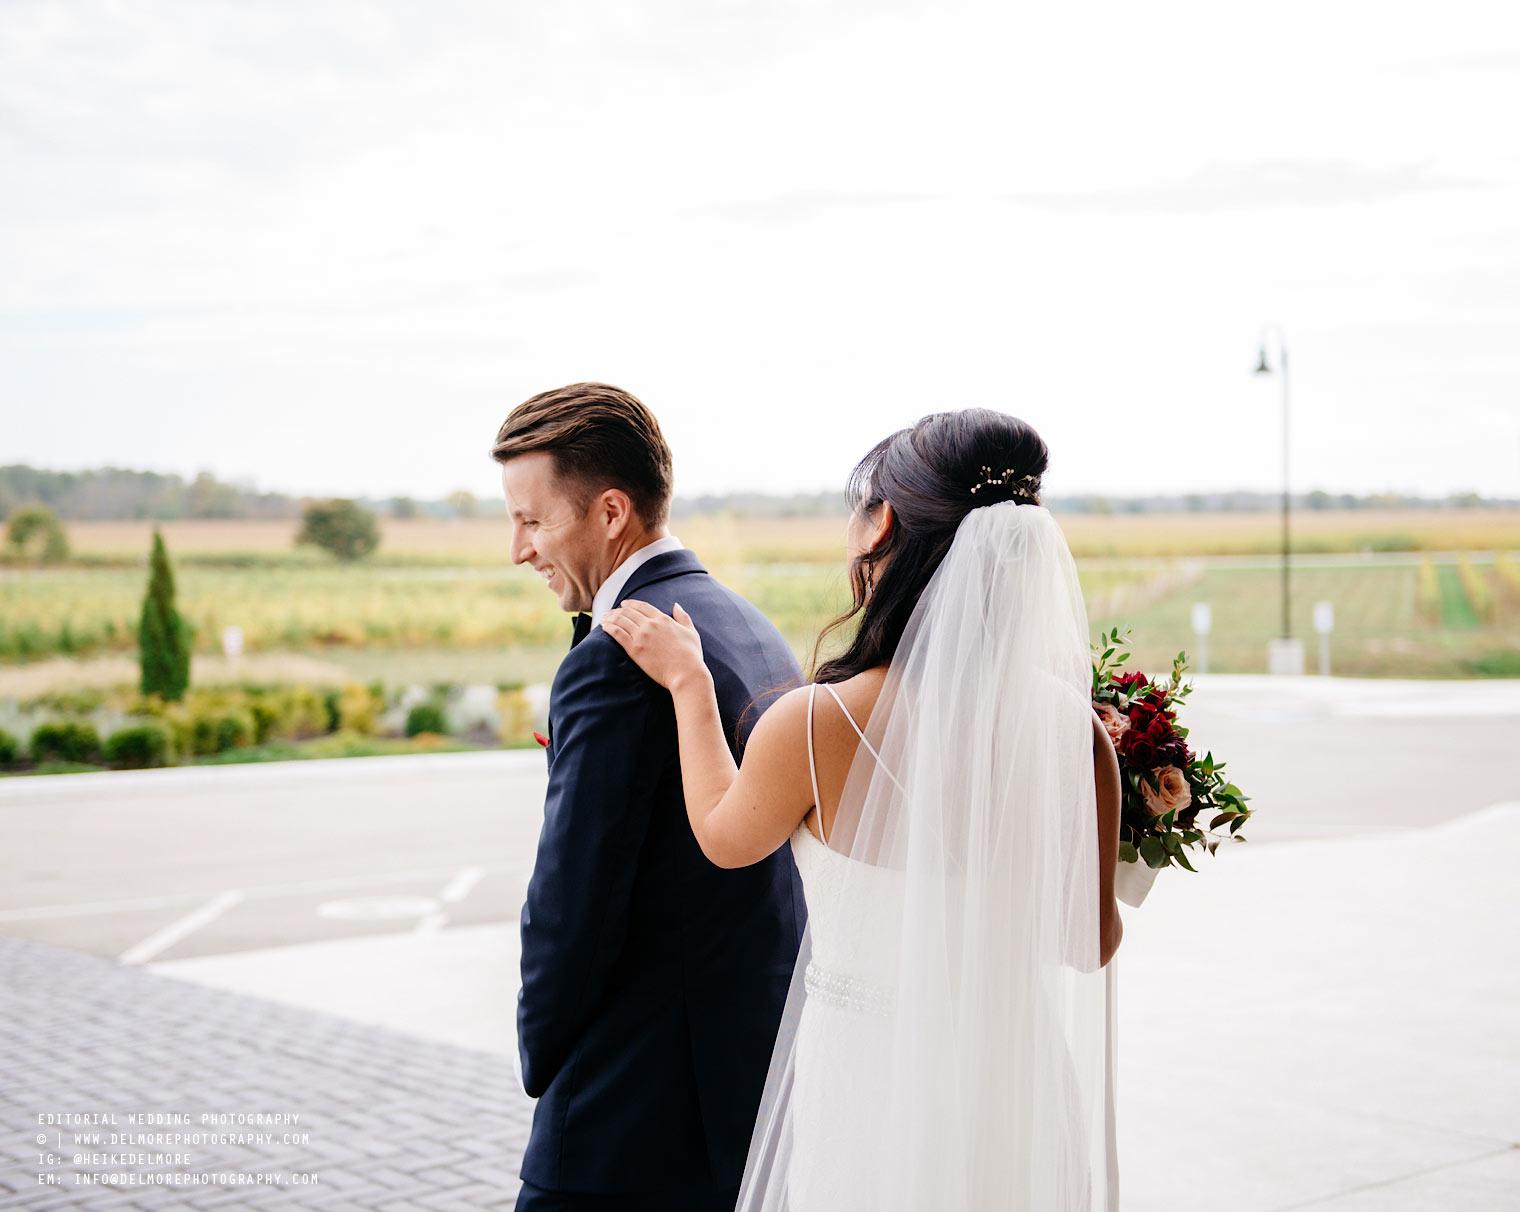 top-windsor-winery-wedding-photographer-015.jpg